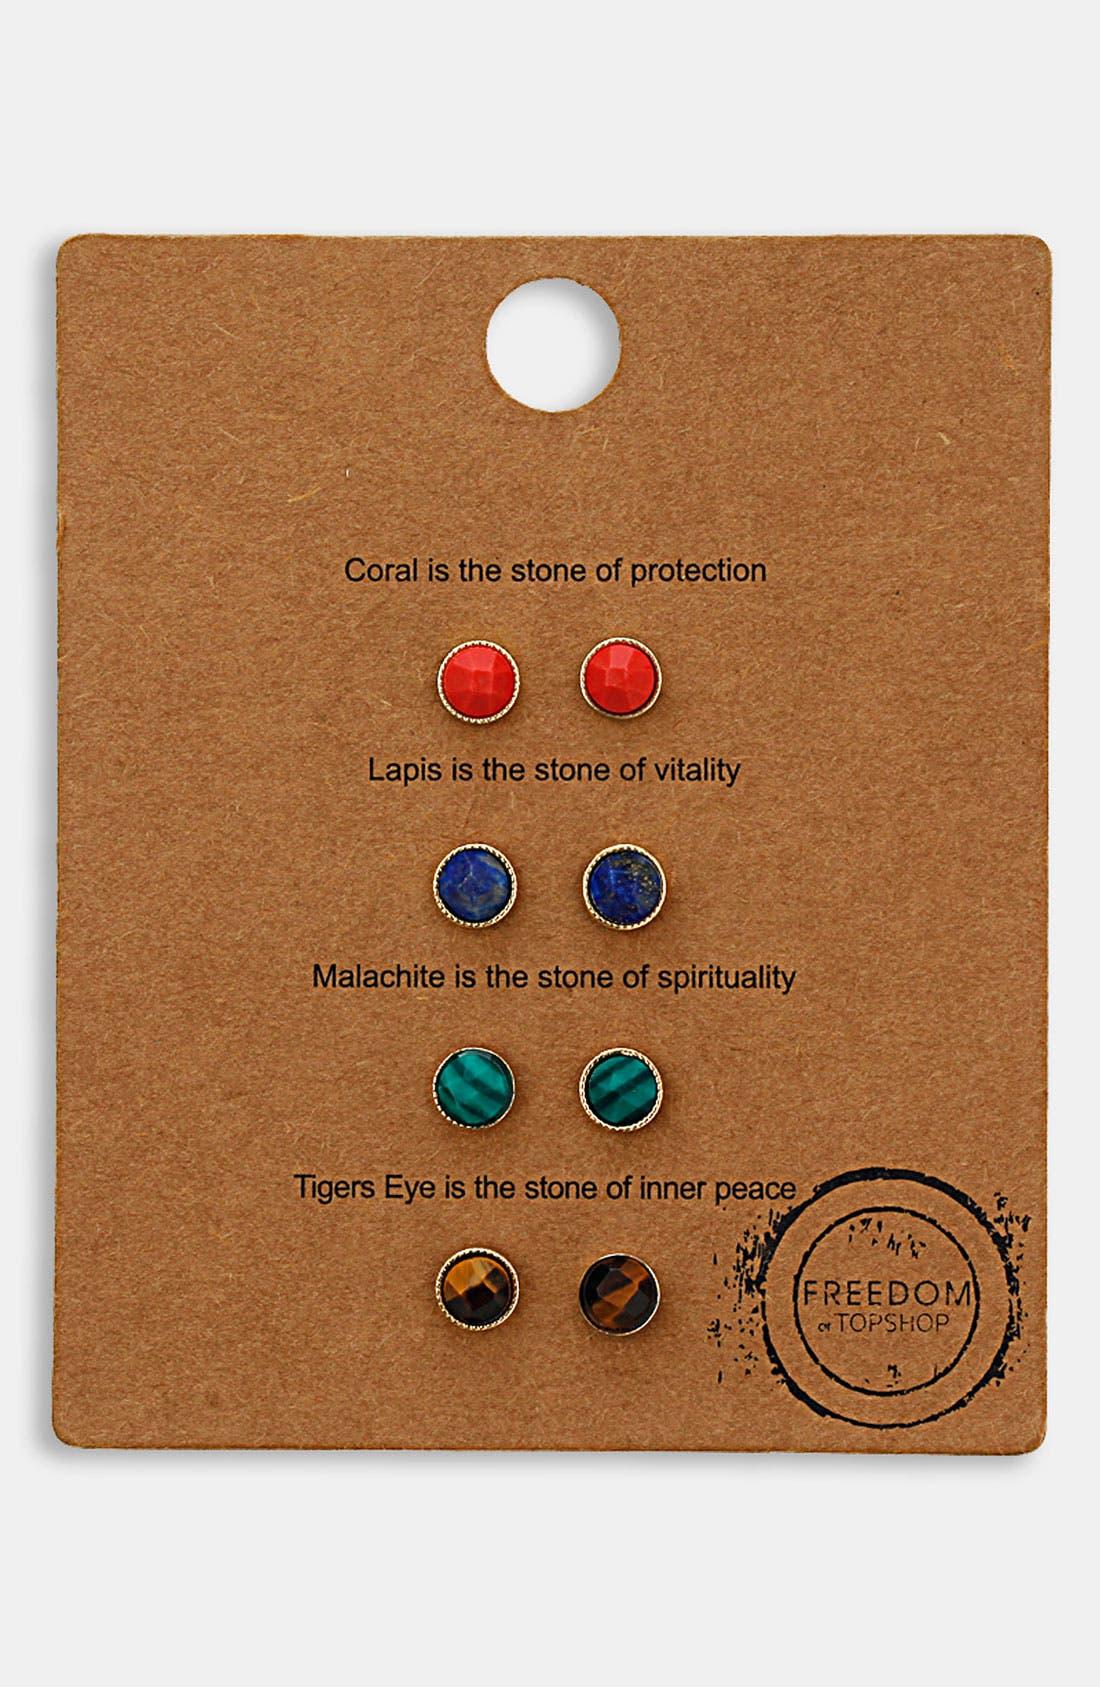 Alternate Image 1 Selected - Topshop 'Message' Stud Earrings (Set of 4)